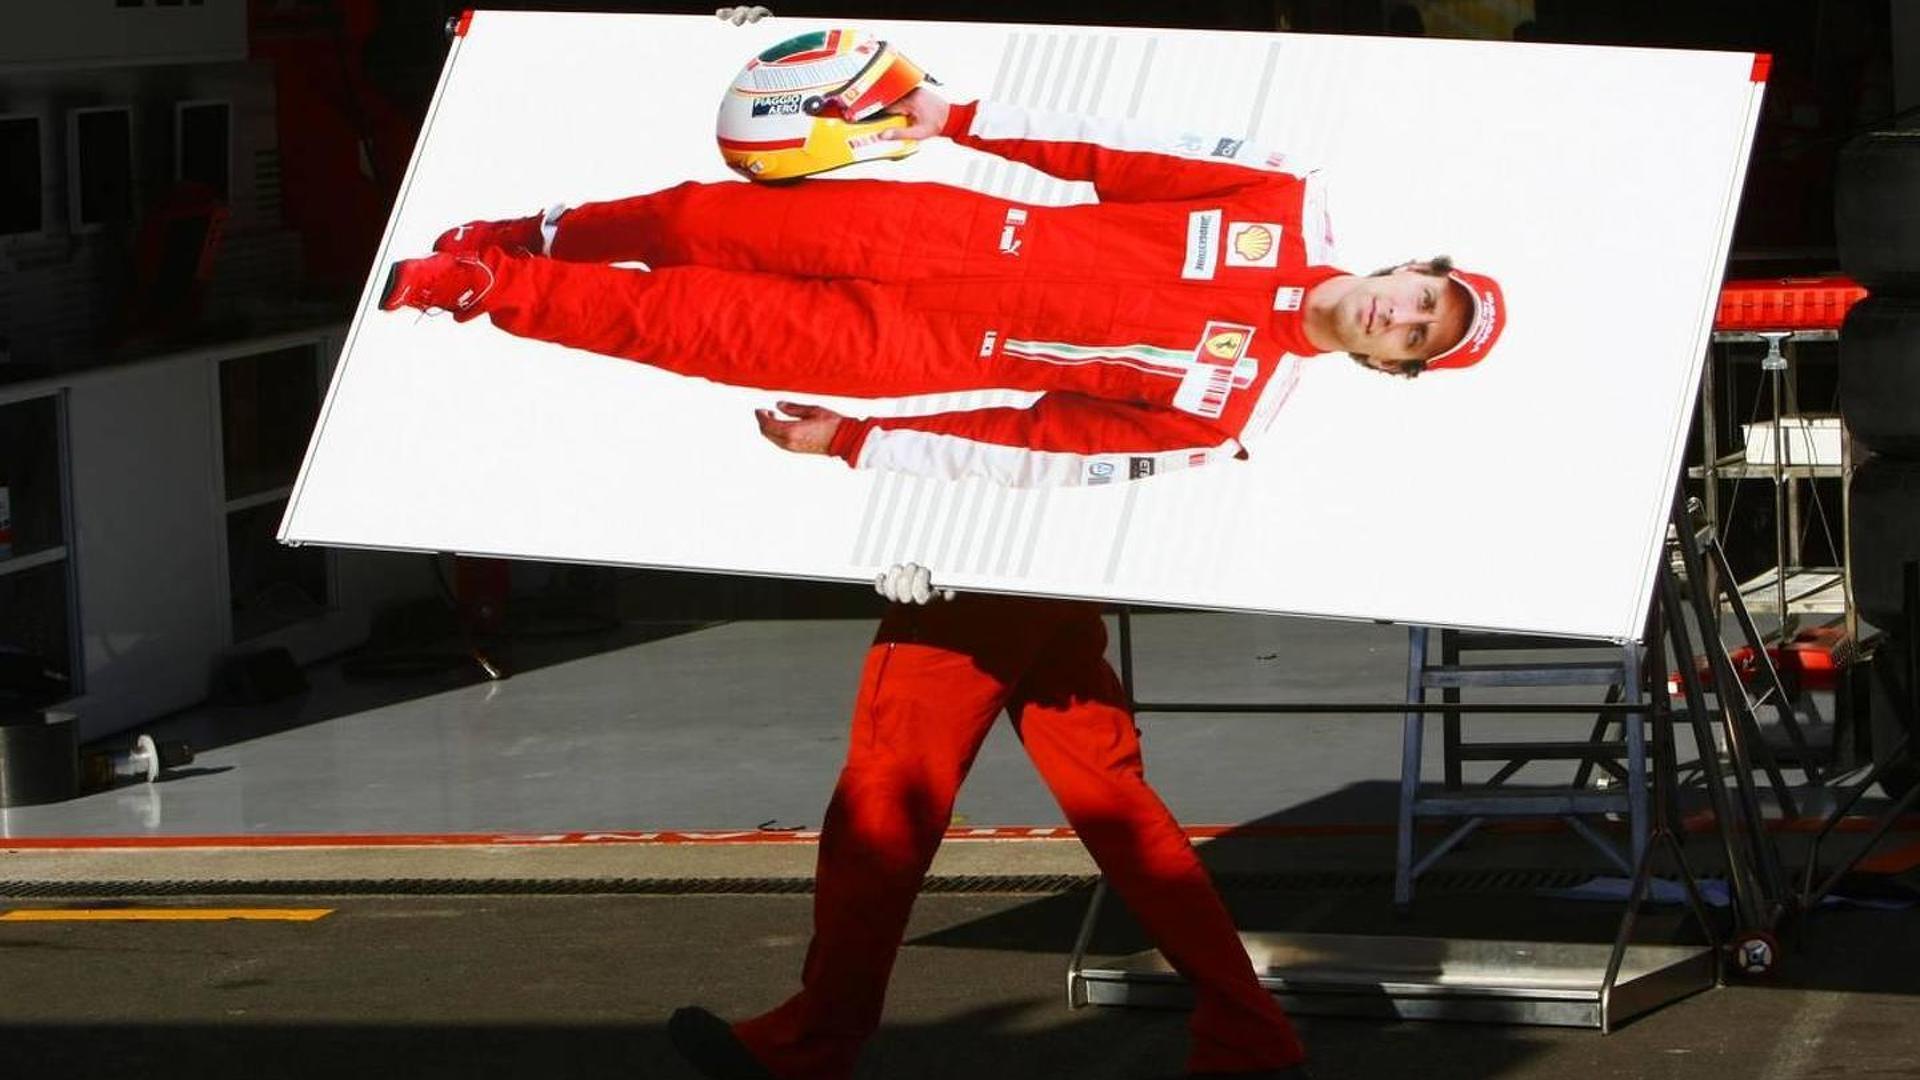 Ferrari confirms Badoer leaving as test driver